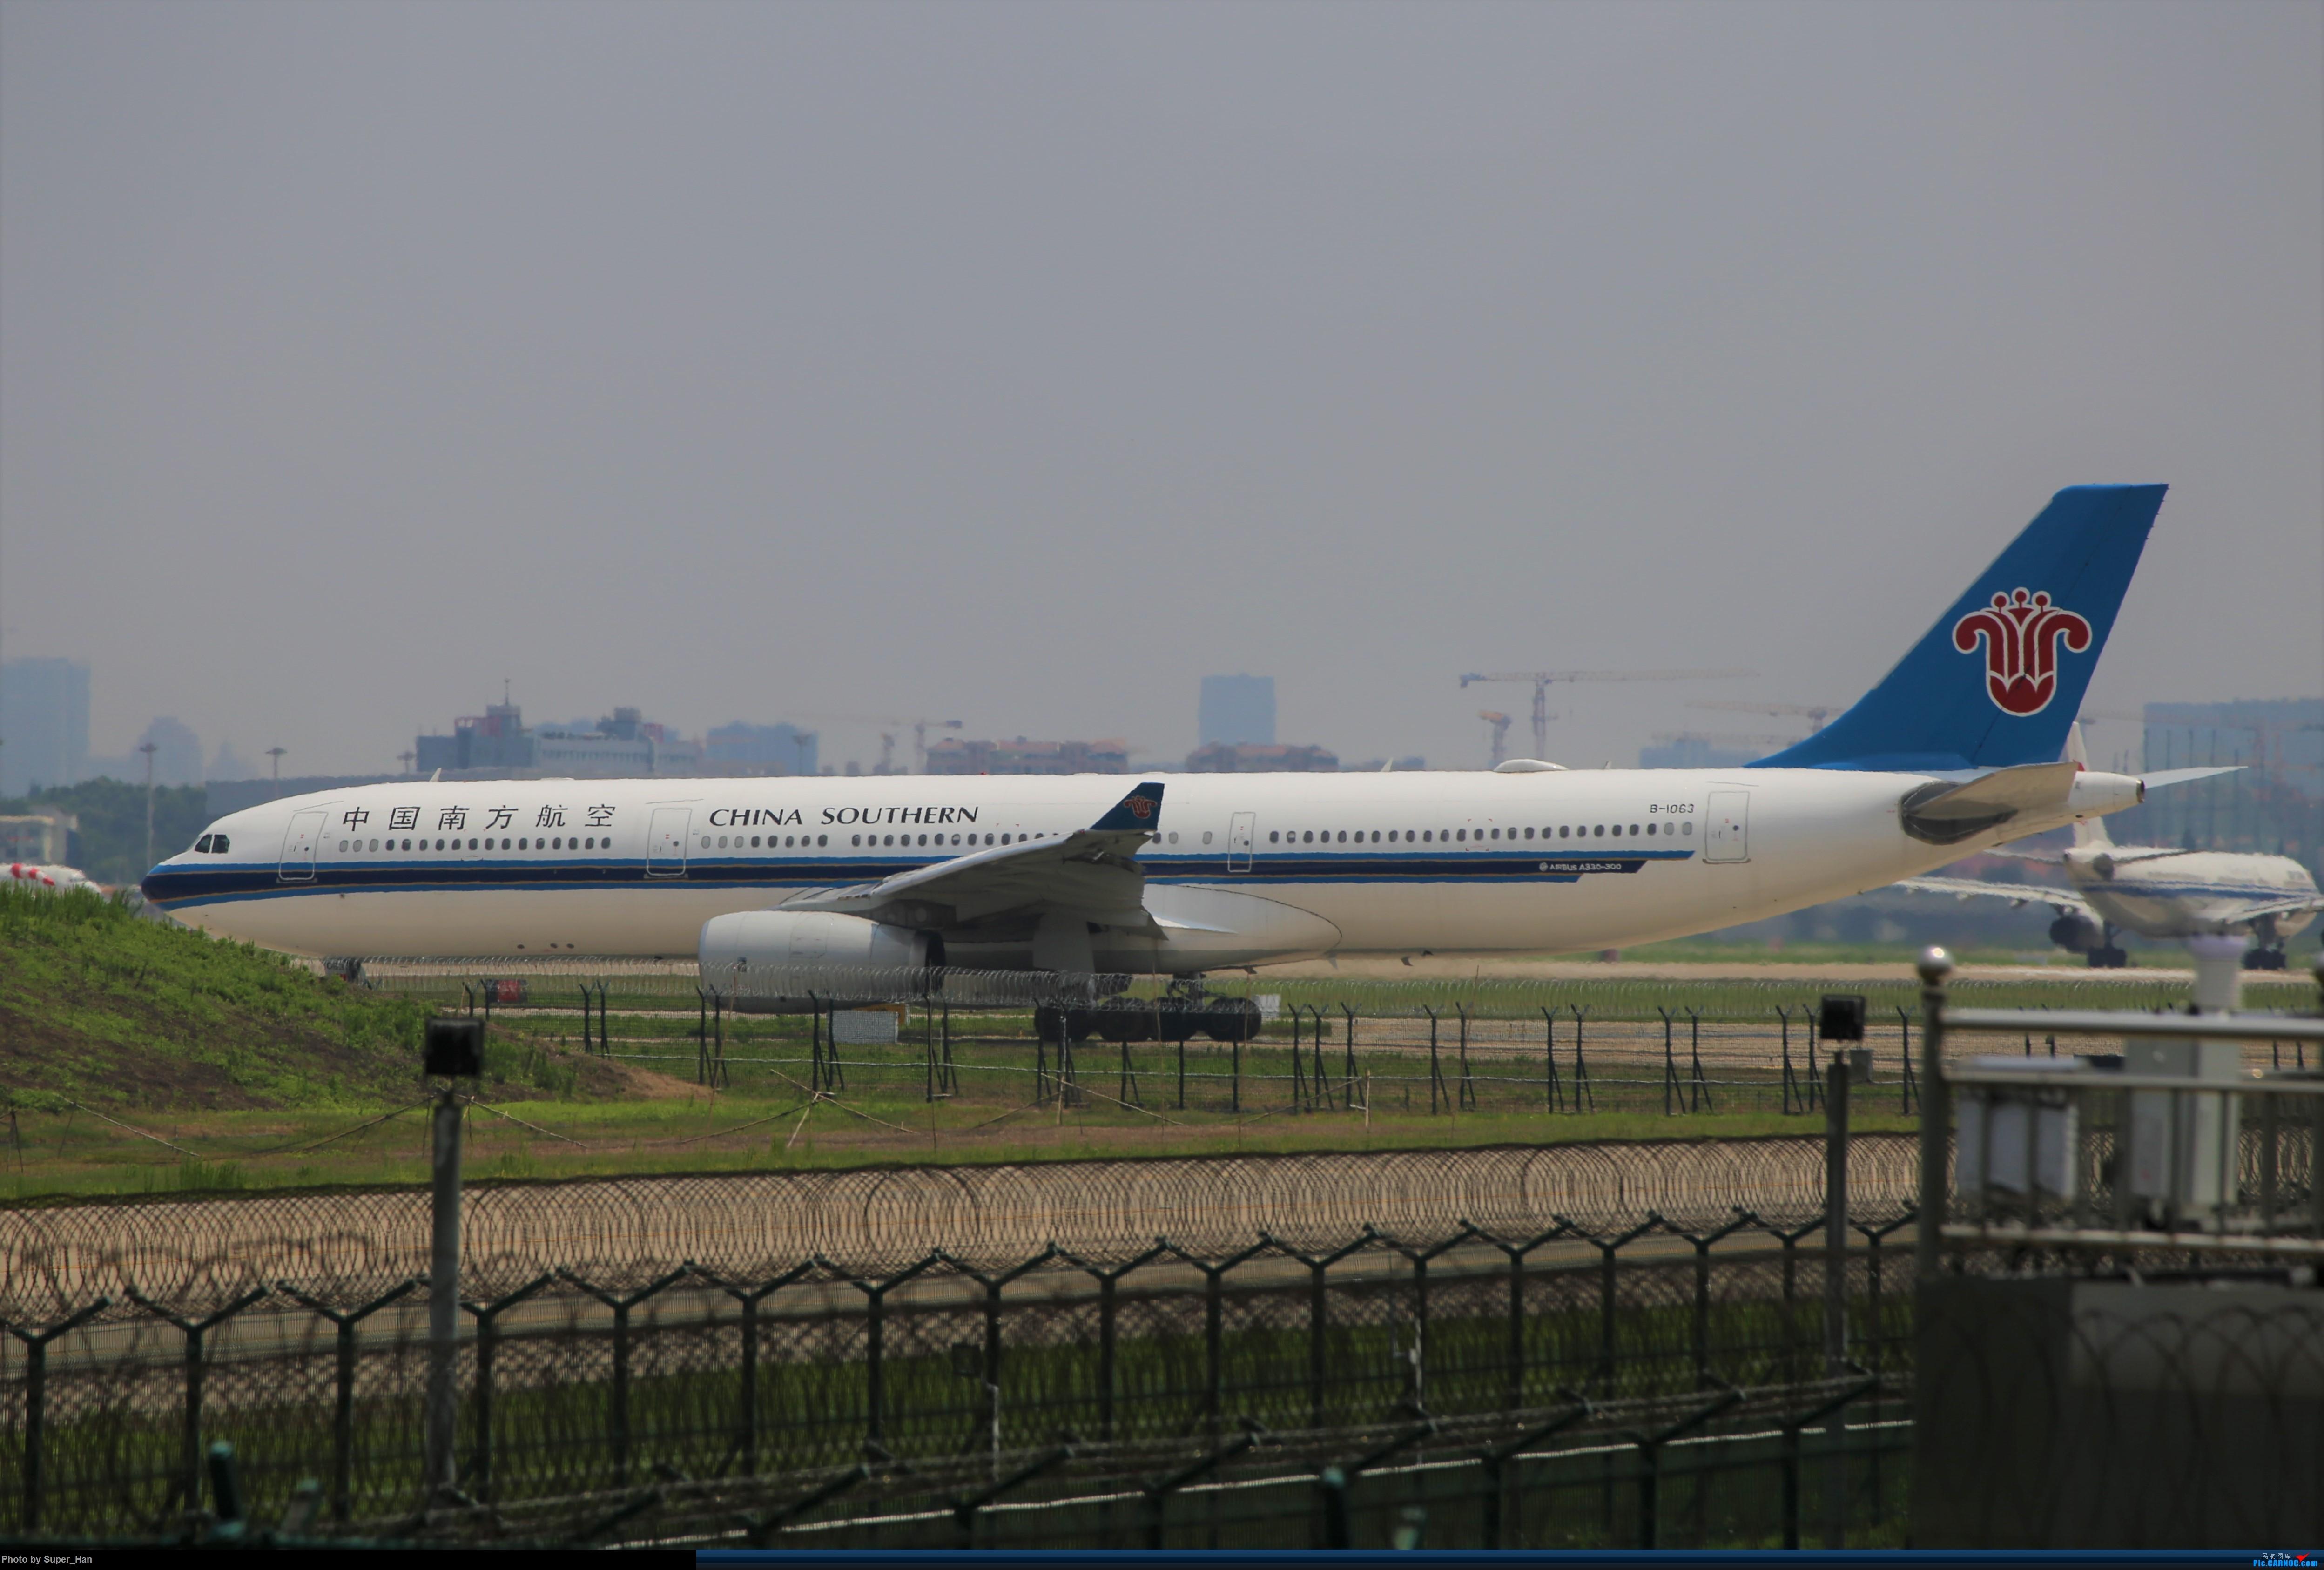 Re:[原创]0715去虹桥说走就走【最多的330篇】 AIRBUS A330-300 B-1063 中国上海虹桥国际机场